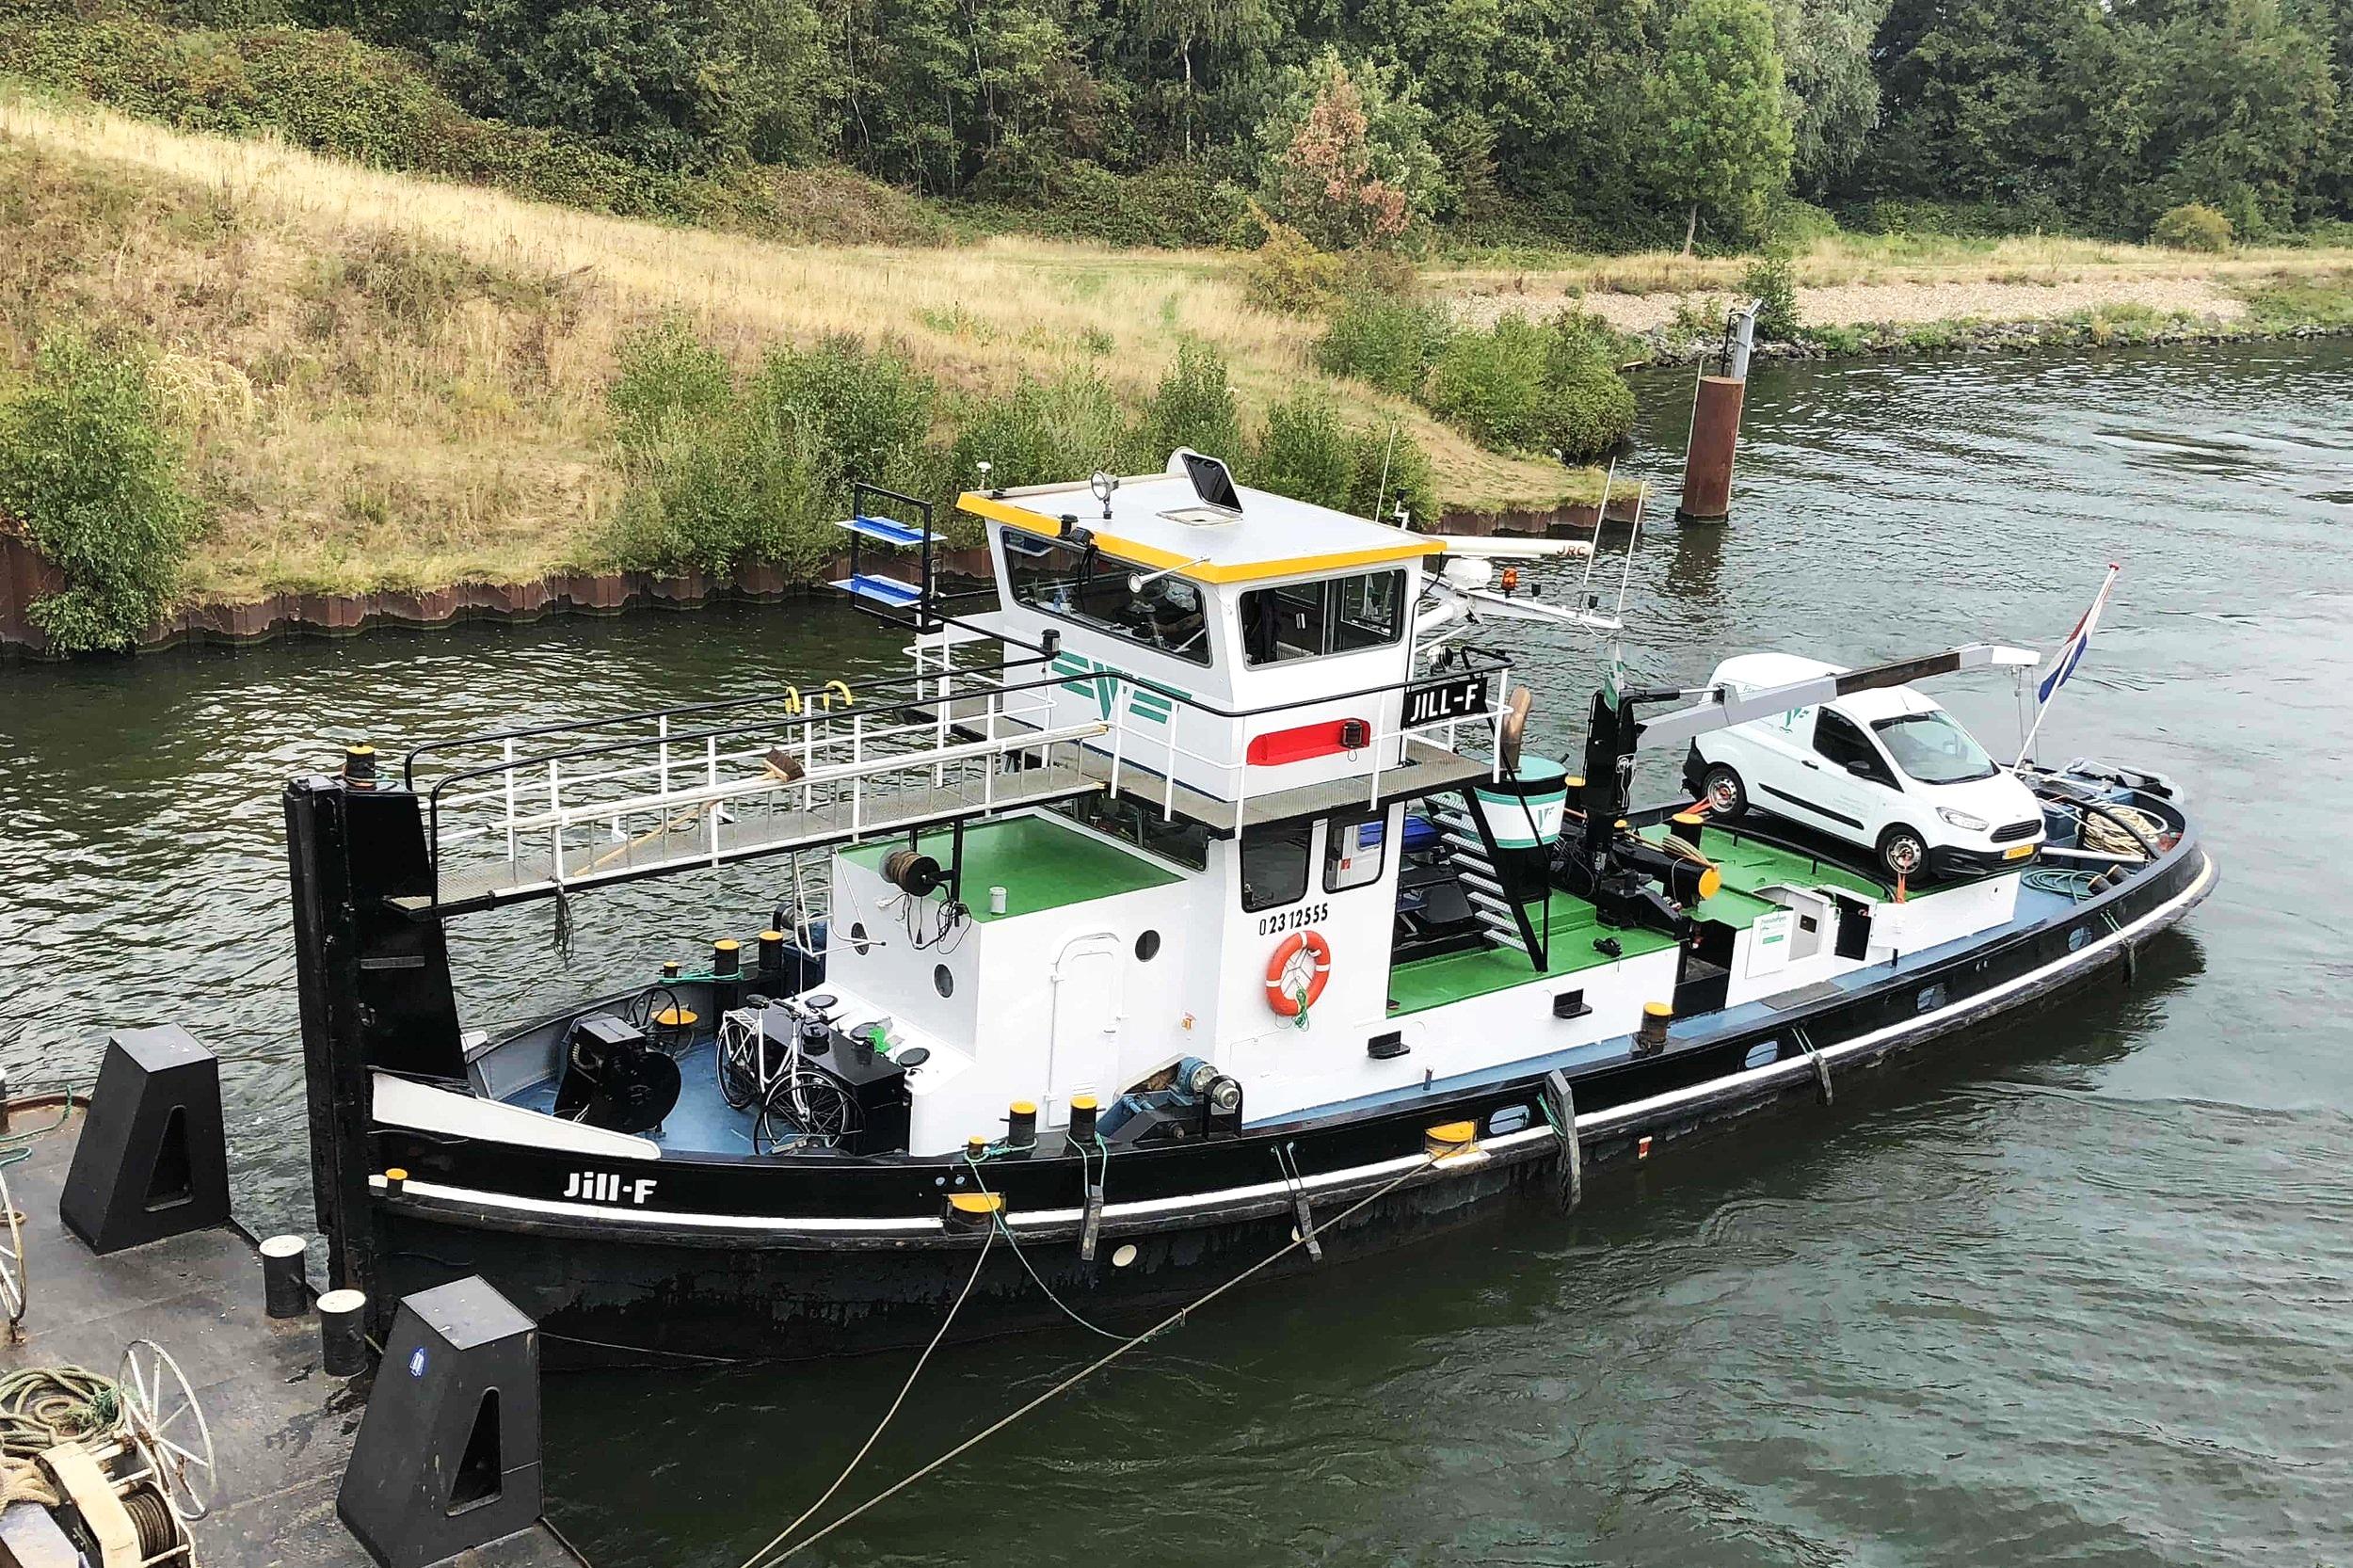 Jill-F - Sleepboot met duwstevenLengte: 23,95mBreedte: 5,95mDiepgang: 2,60m